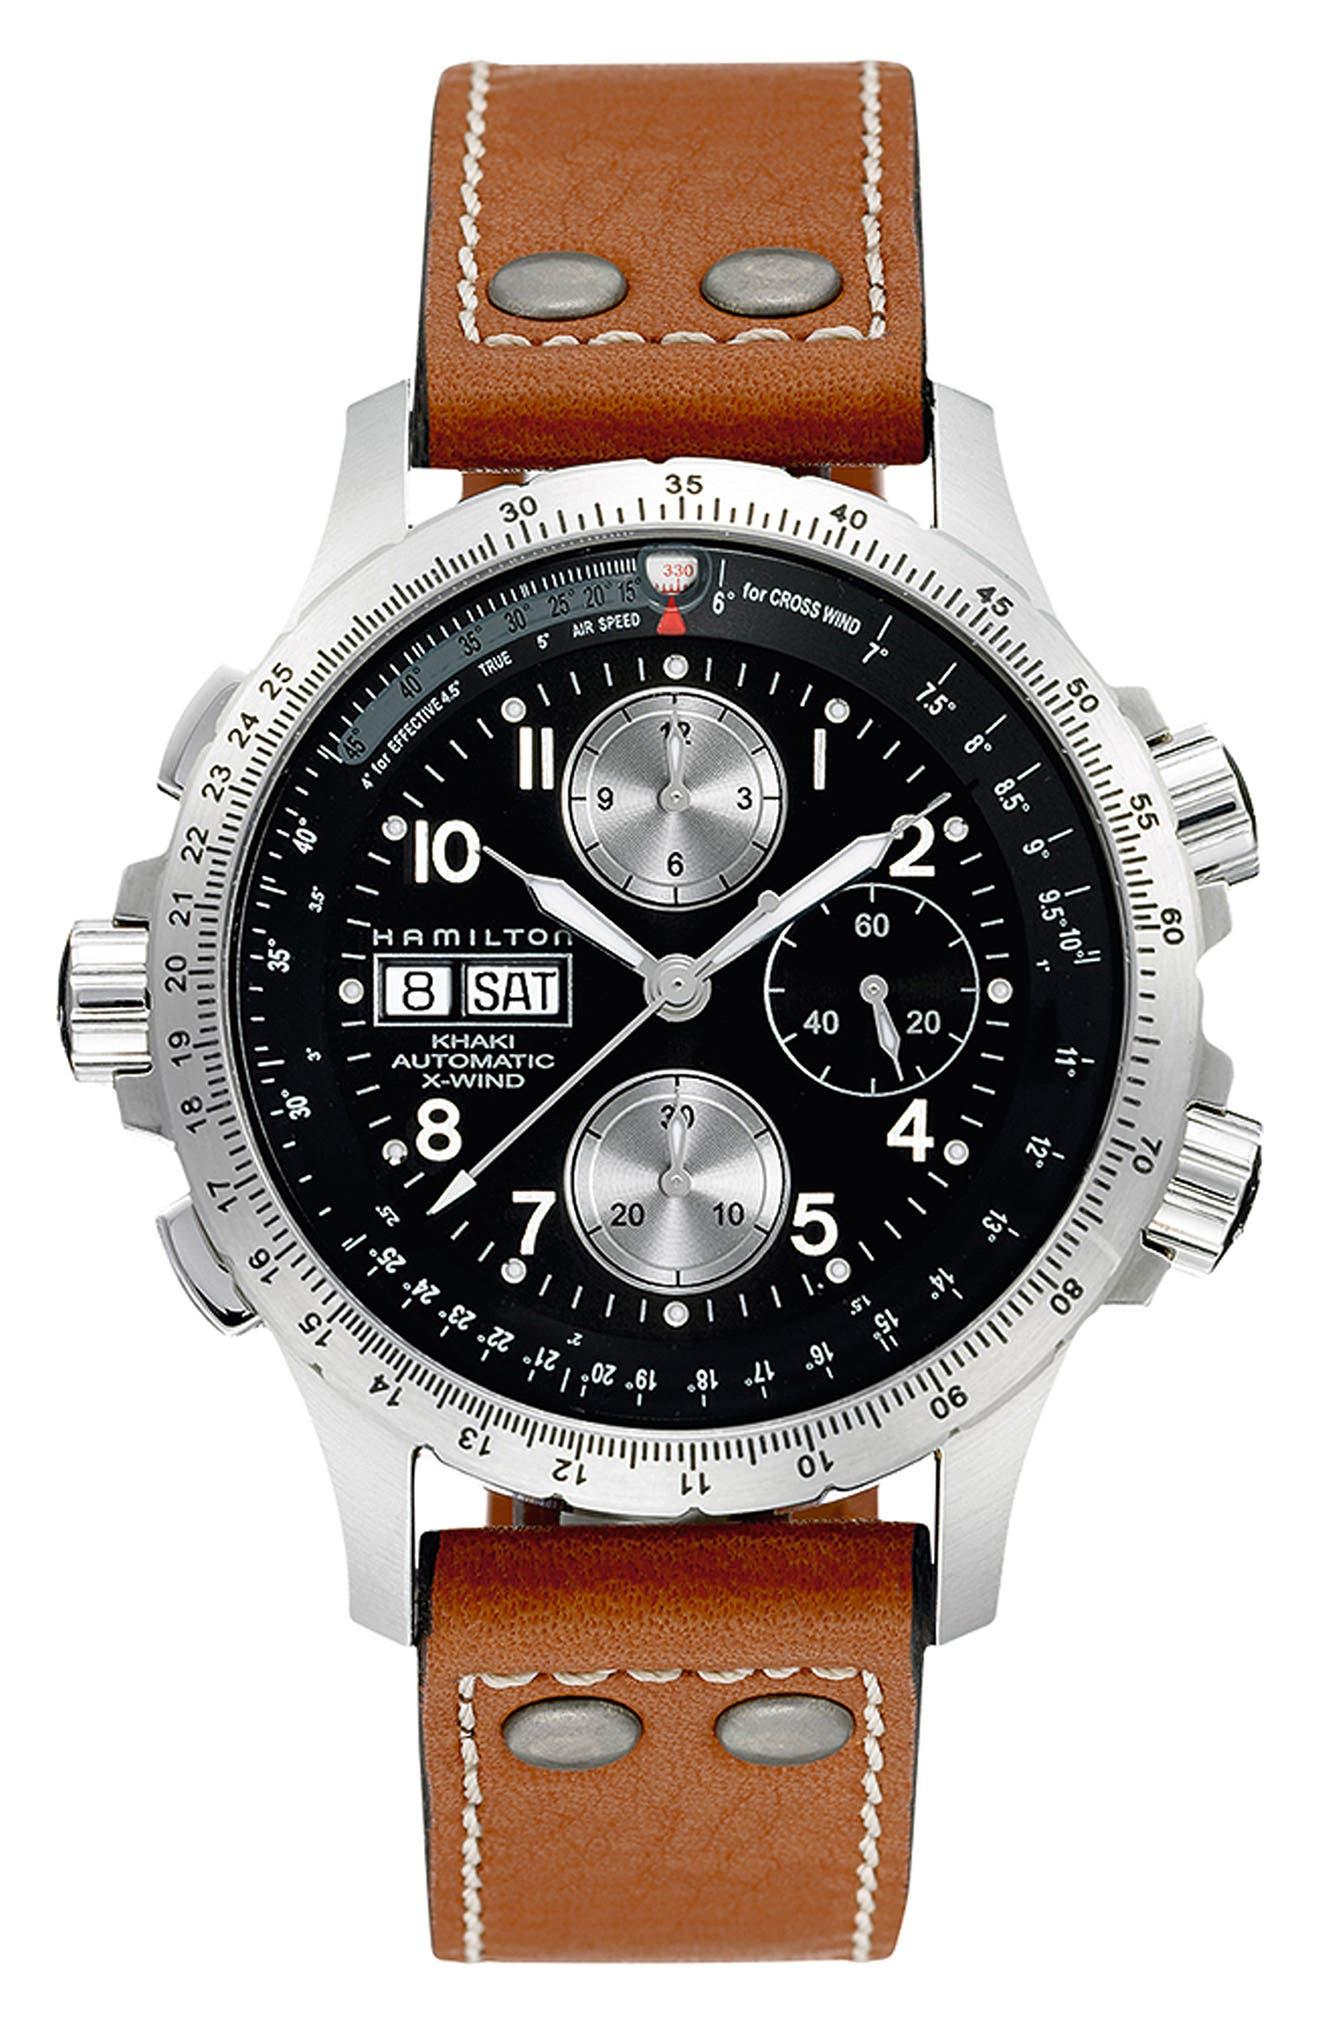 HAMILTON, Khaki Aviation X-Wind Automatic Chronograph Leather Strap Watch, 44mm, Main thumbnail 1, color, BROWN/ BLACK/ SILVER